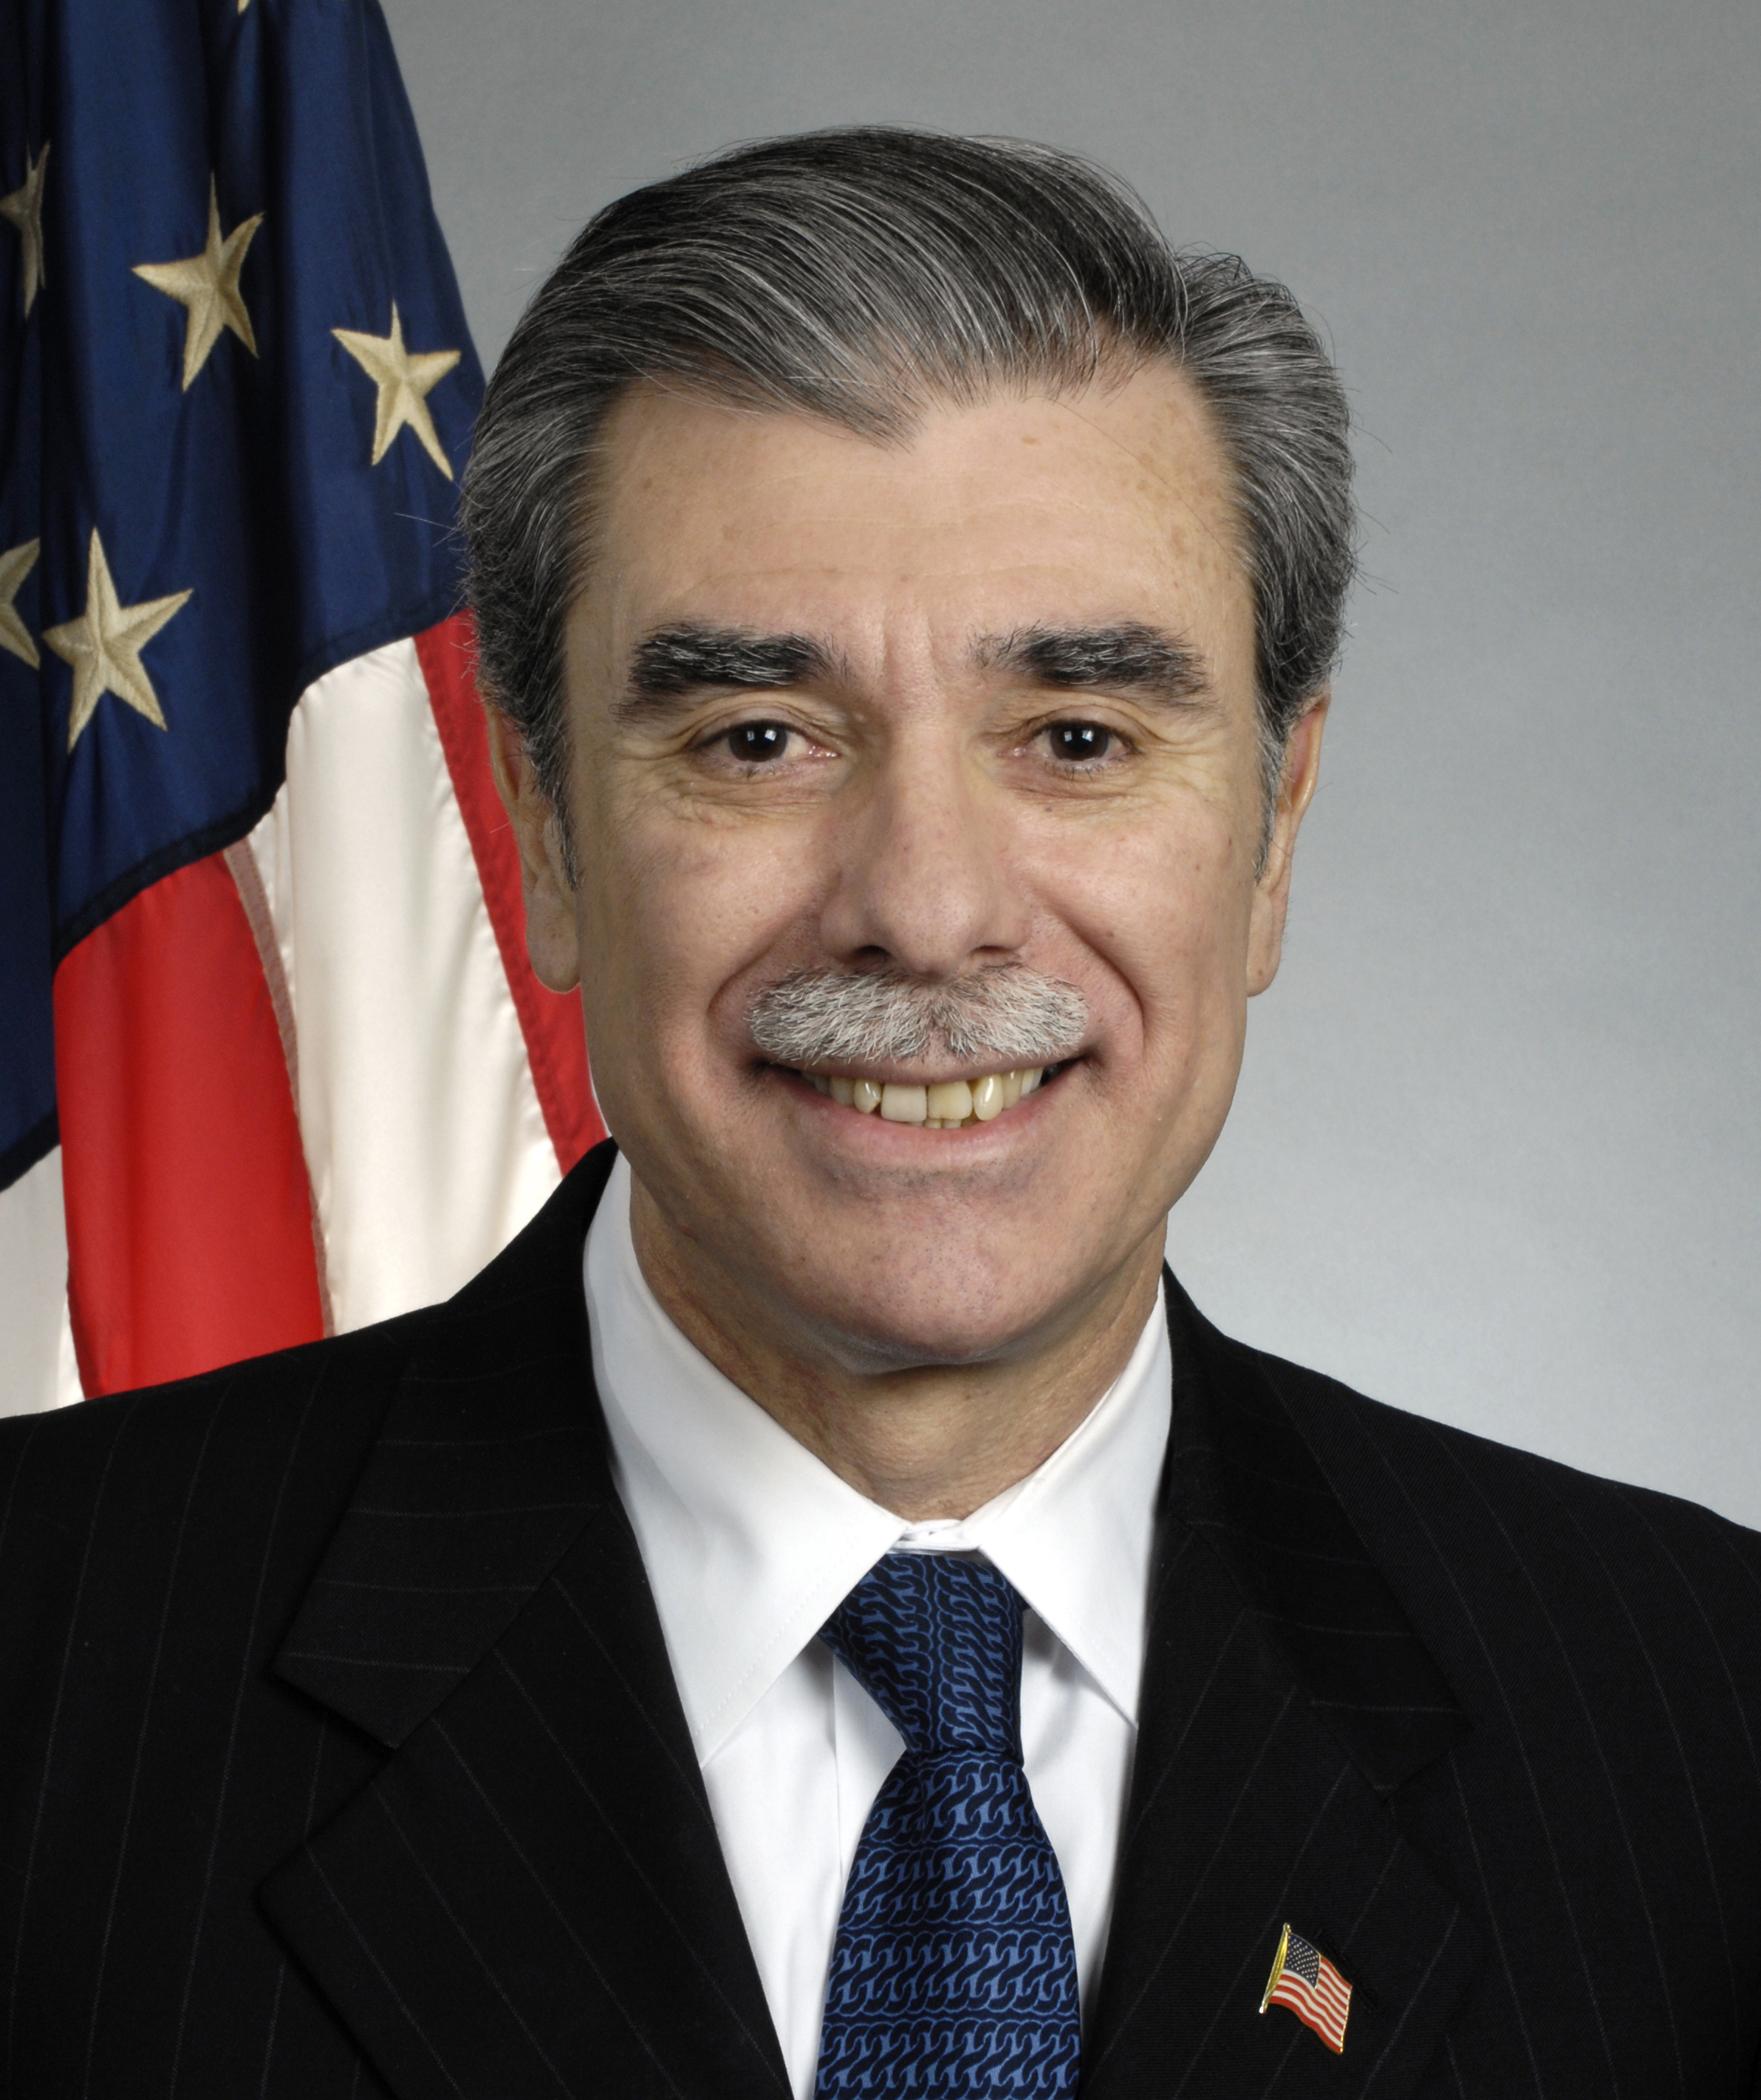 Carlos Gutierrez net worth